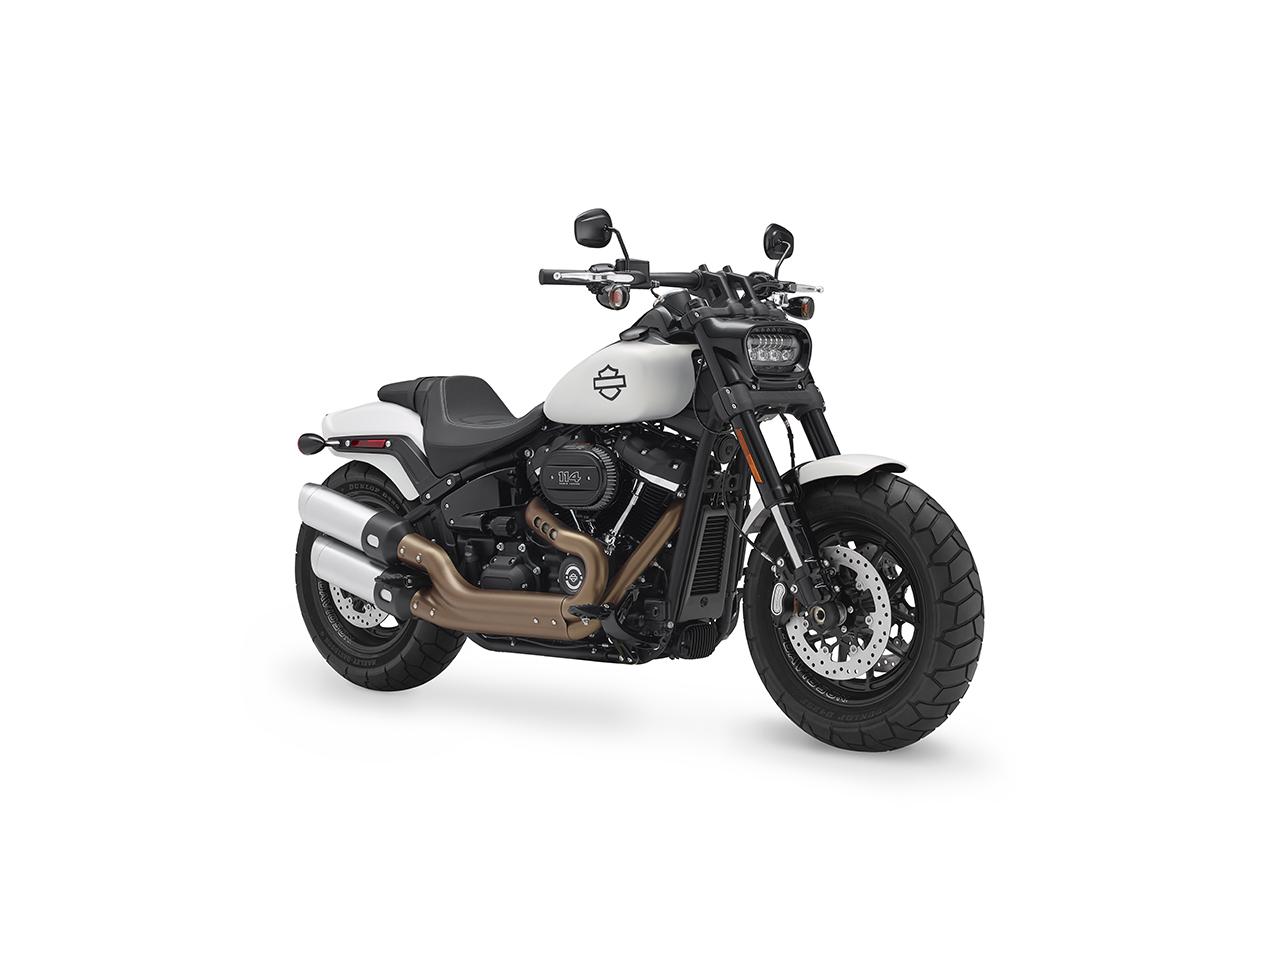 2018 Harley-Davidson Fat Bob 114 Image